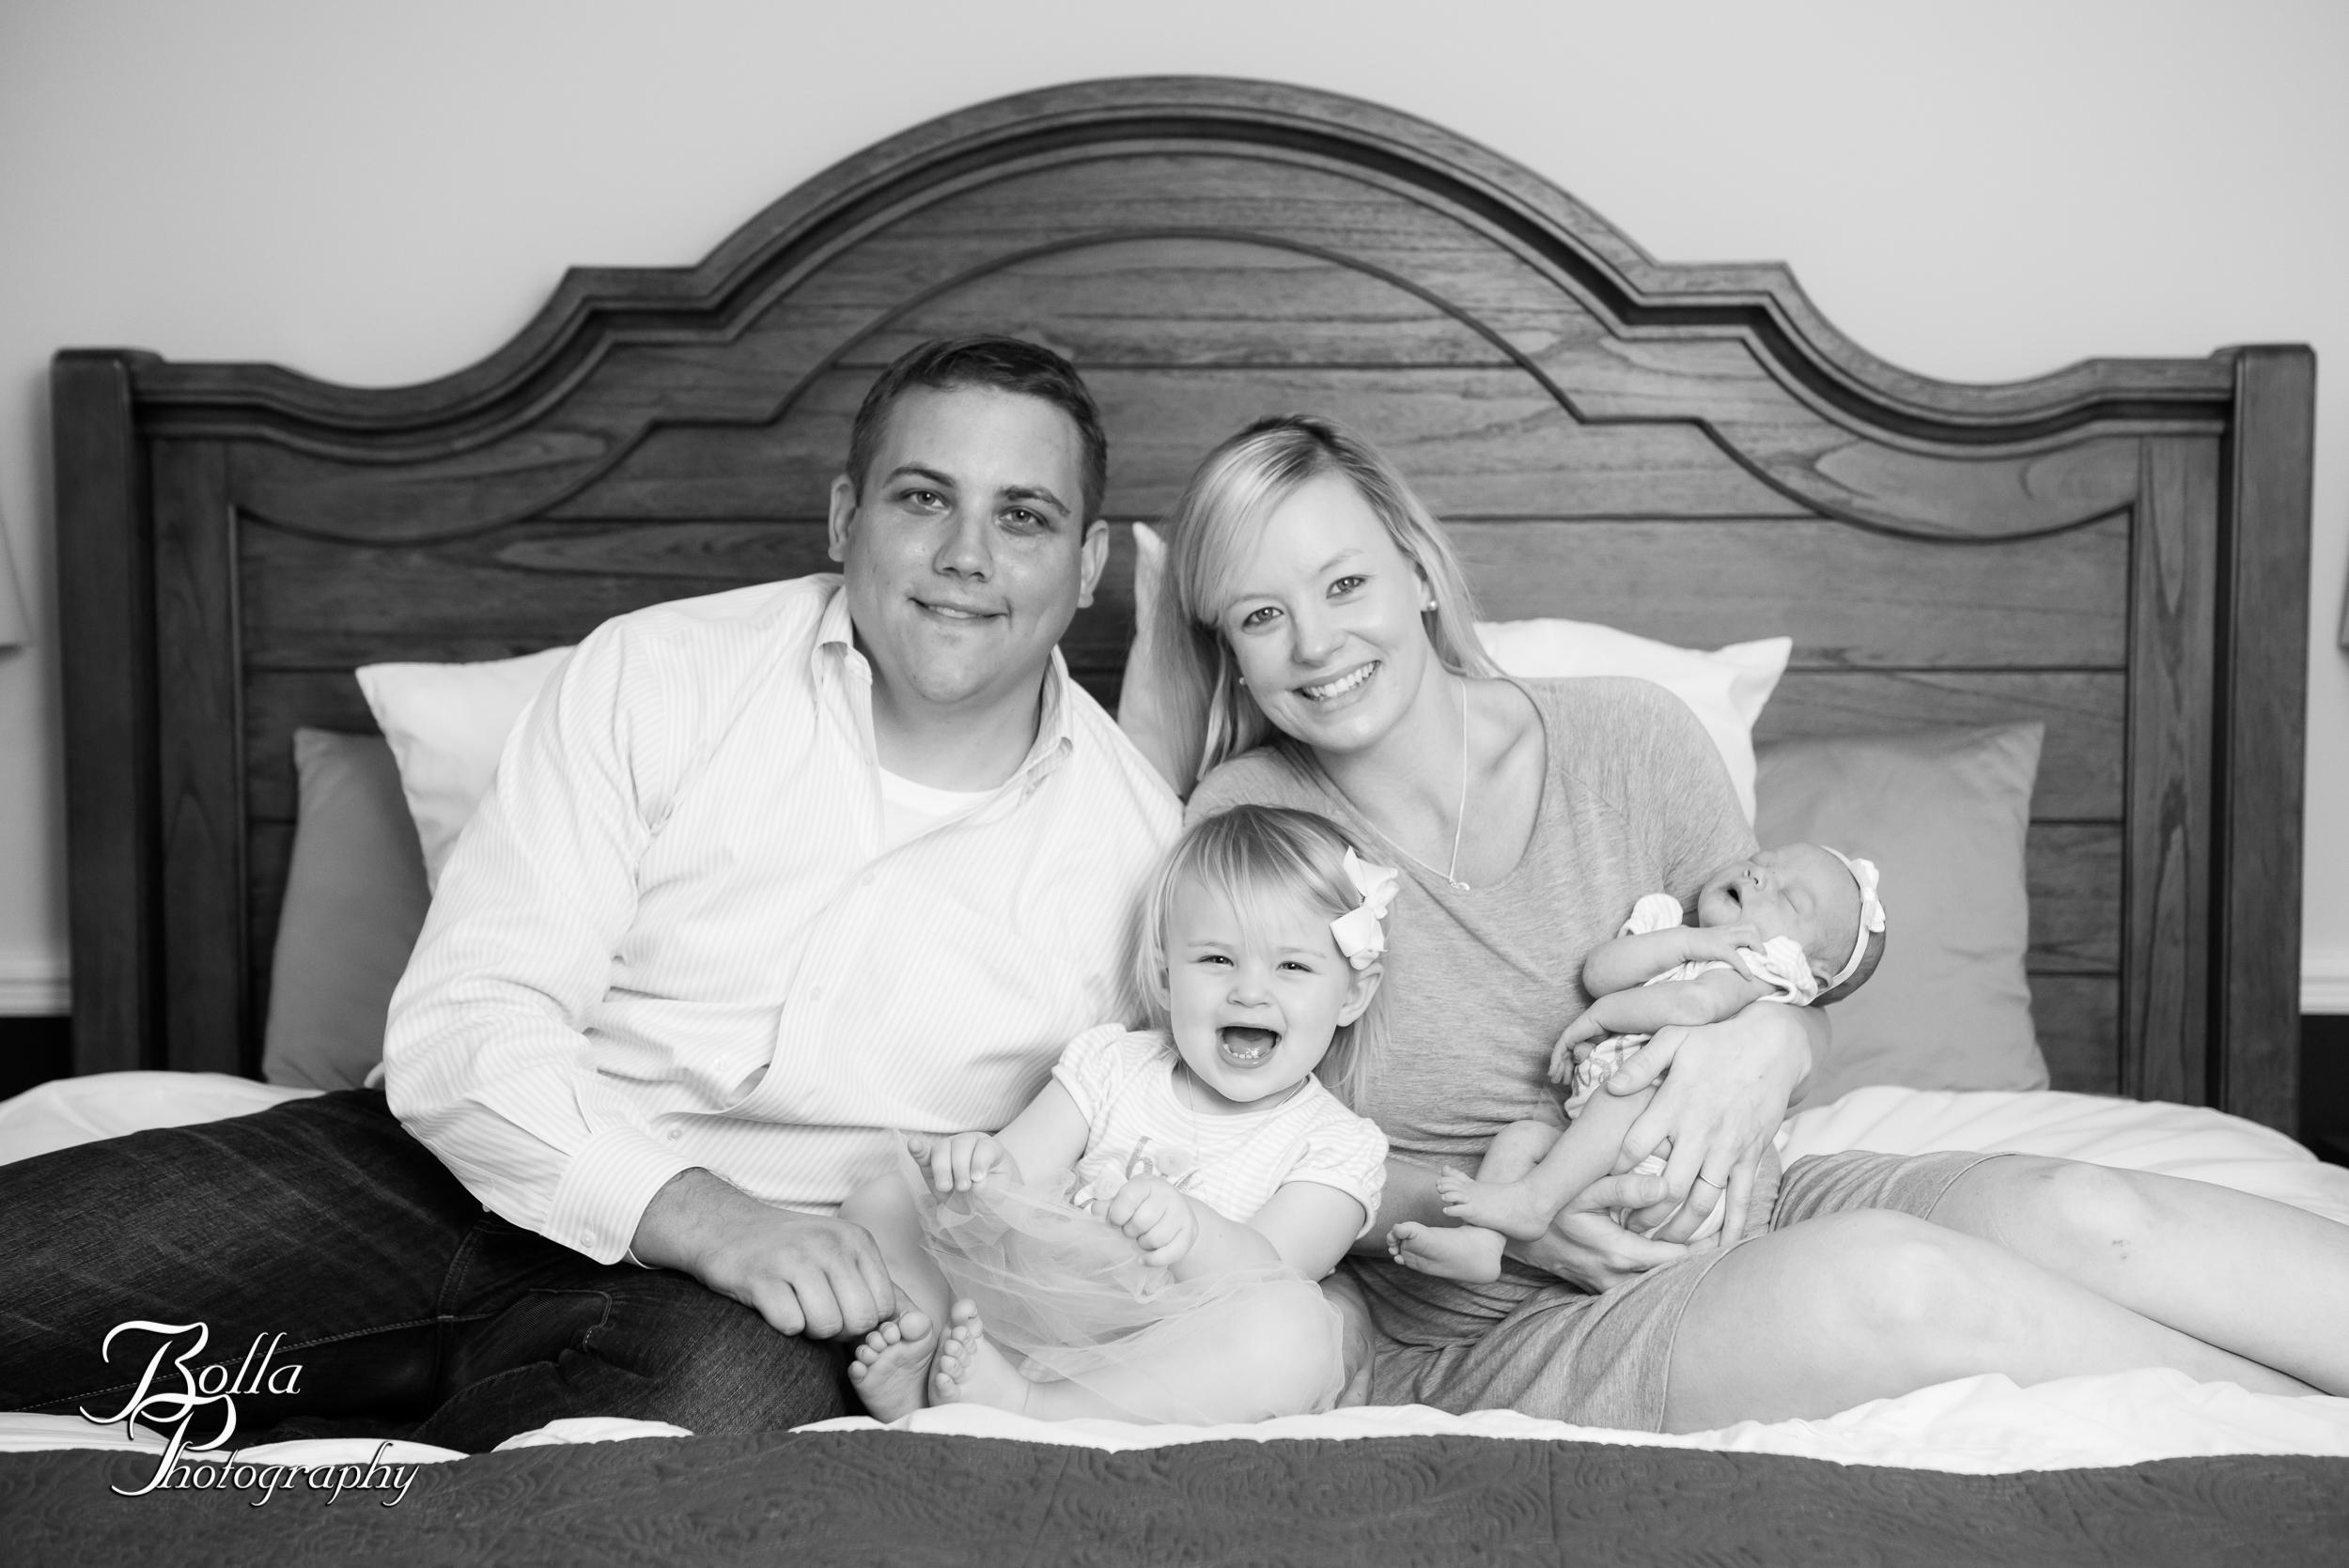 20170820_Bolla photography edwardsville wedding newborn baby photographer st louis weddings babies-2-3.jpg